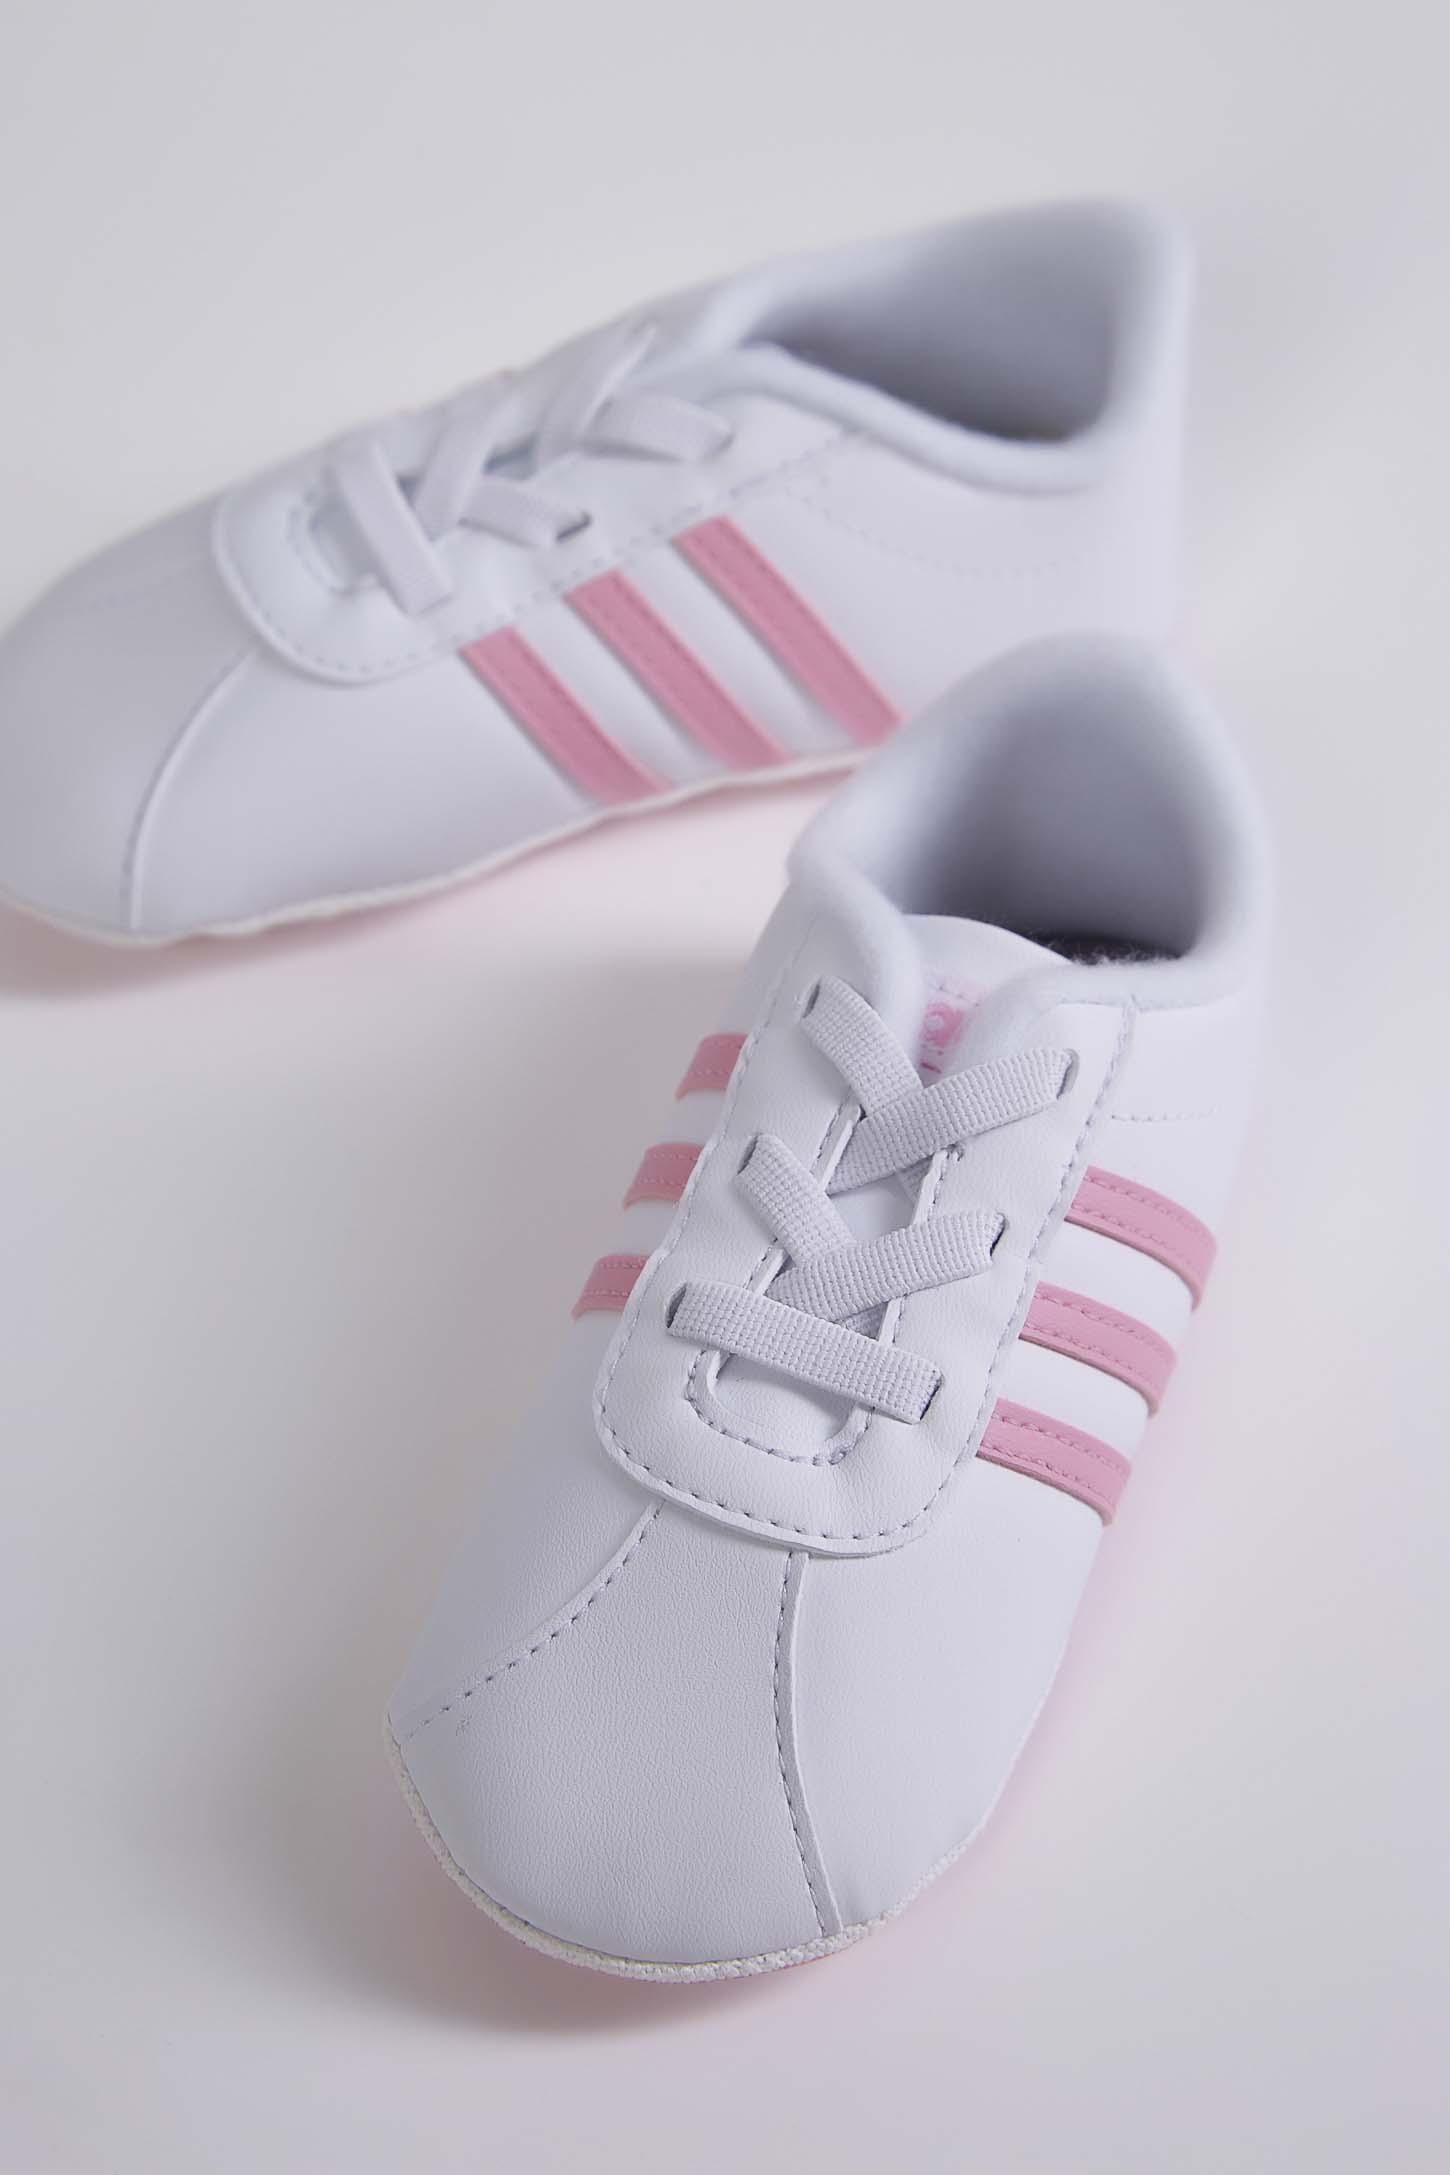 Tenis-Infantil-Adidas-Vl-Court-2.0-Crib-Branco